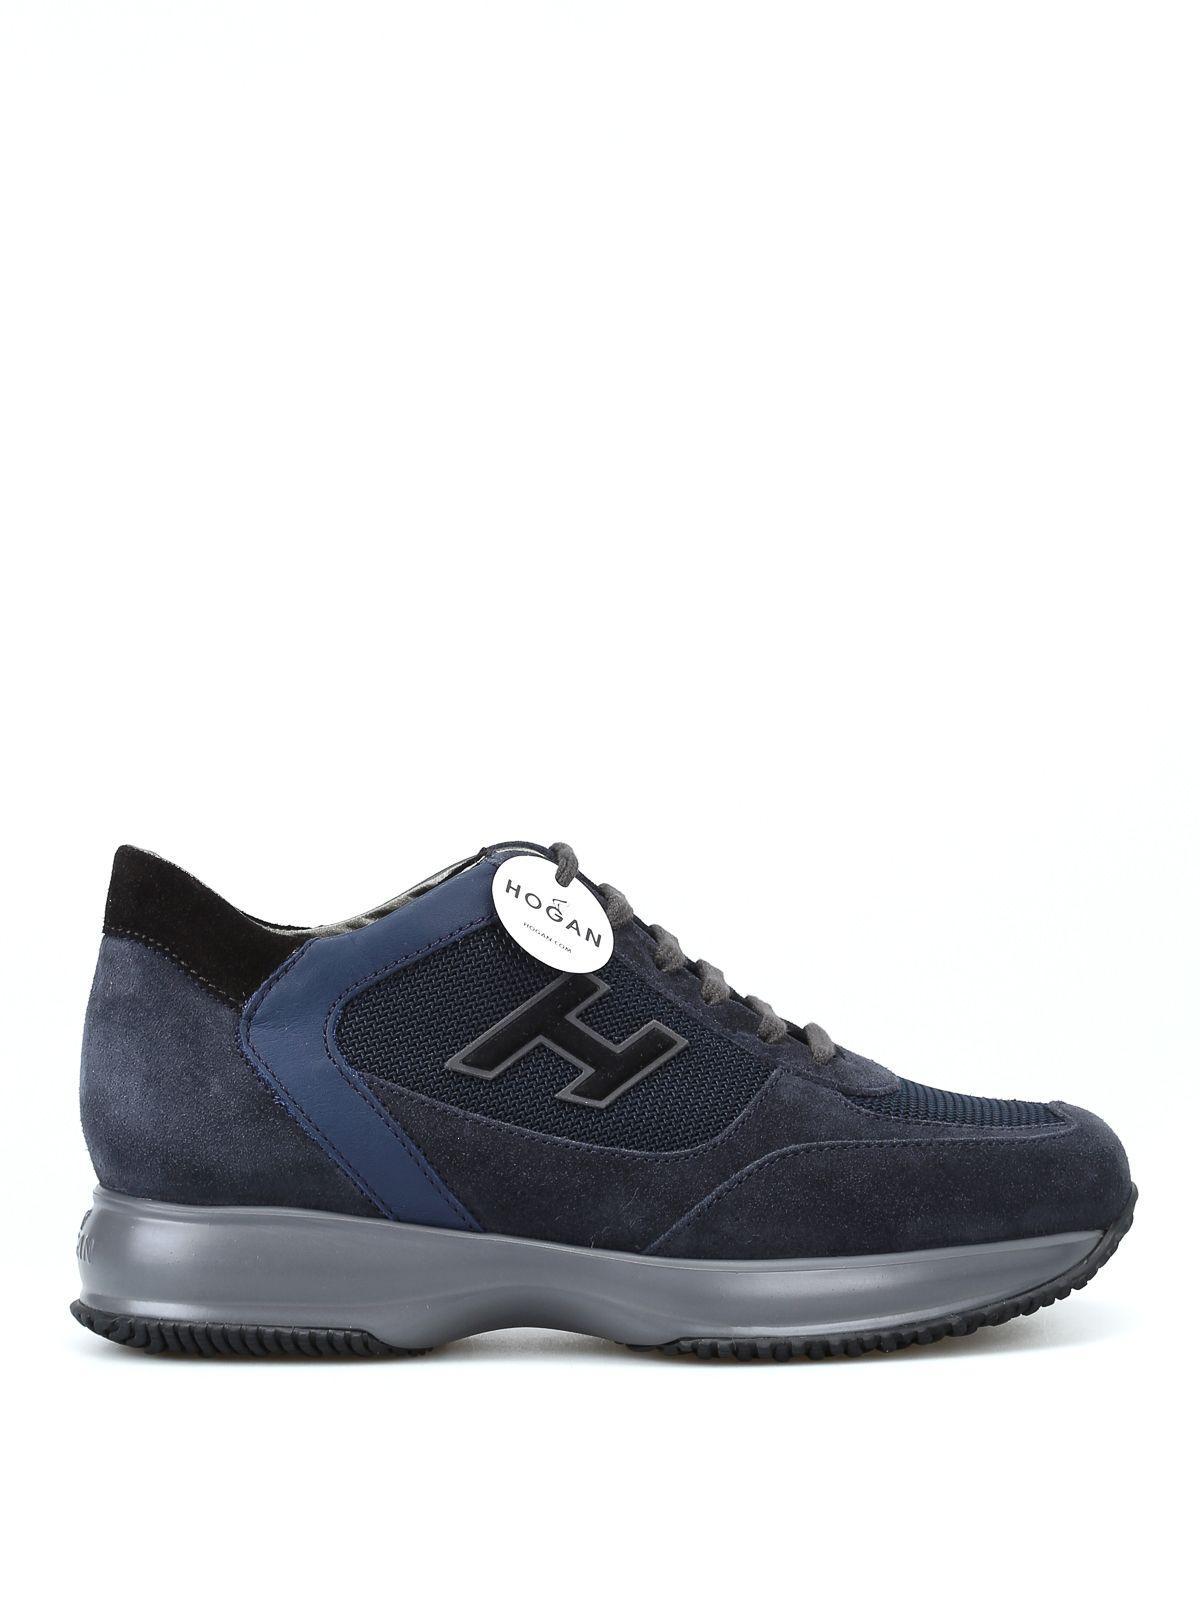 Hogan New Interactive Blue Suede Sneakers In Dark Blue